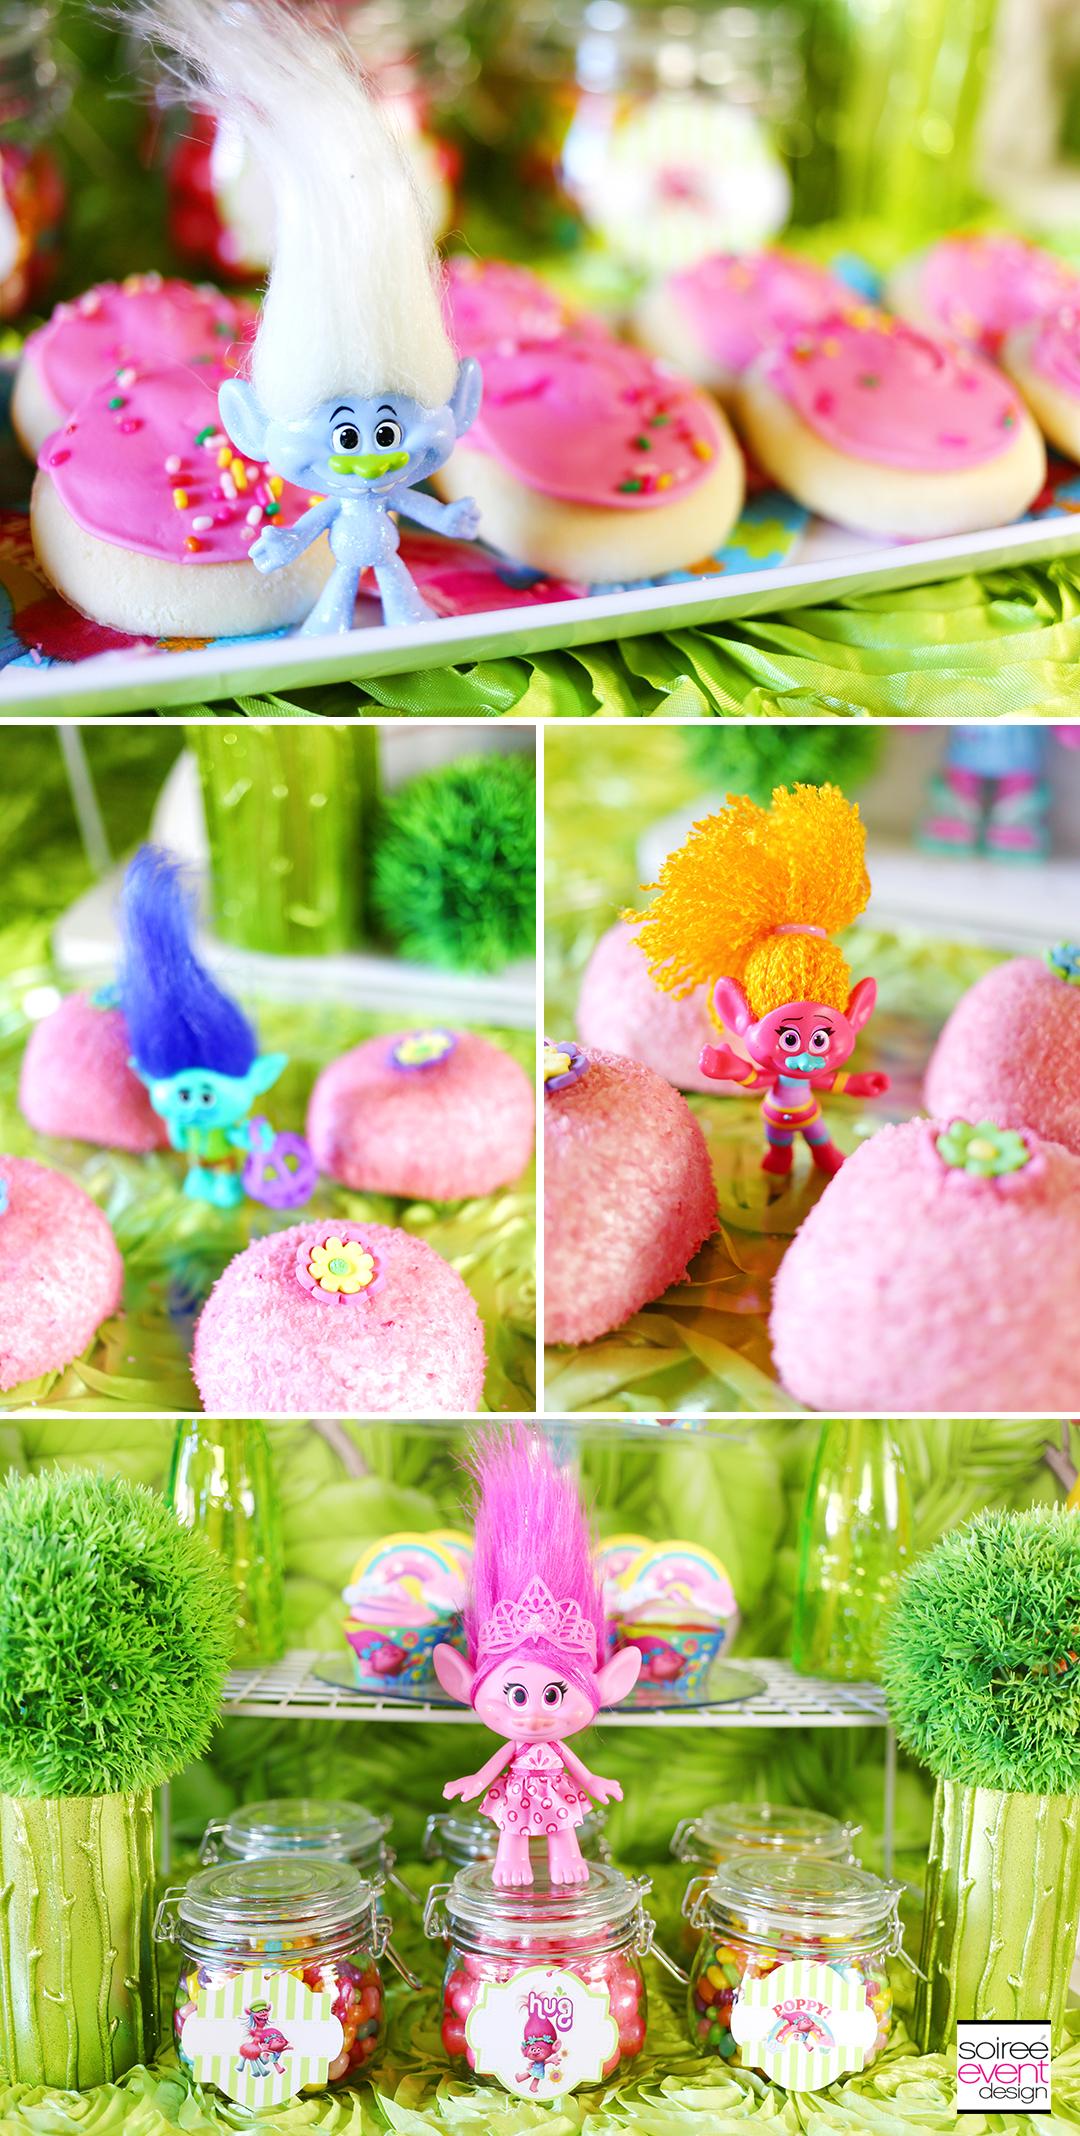 Trolls party ideas - Trolls Desserts